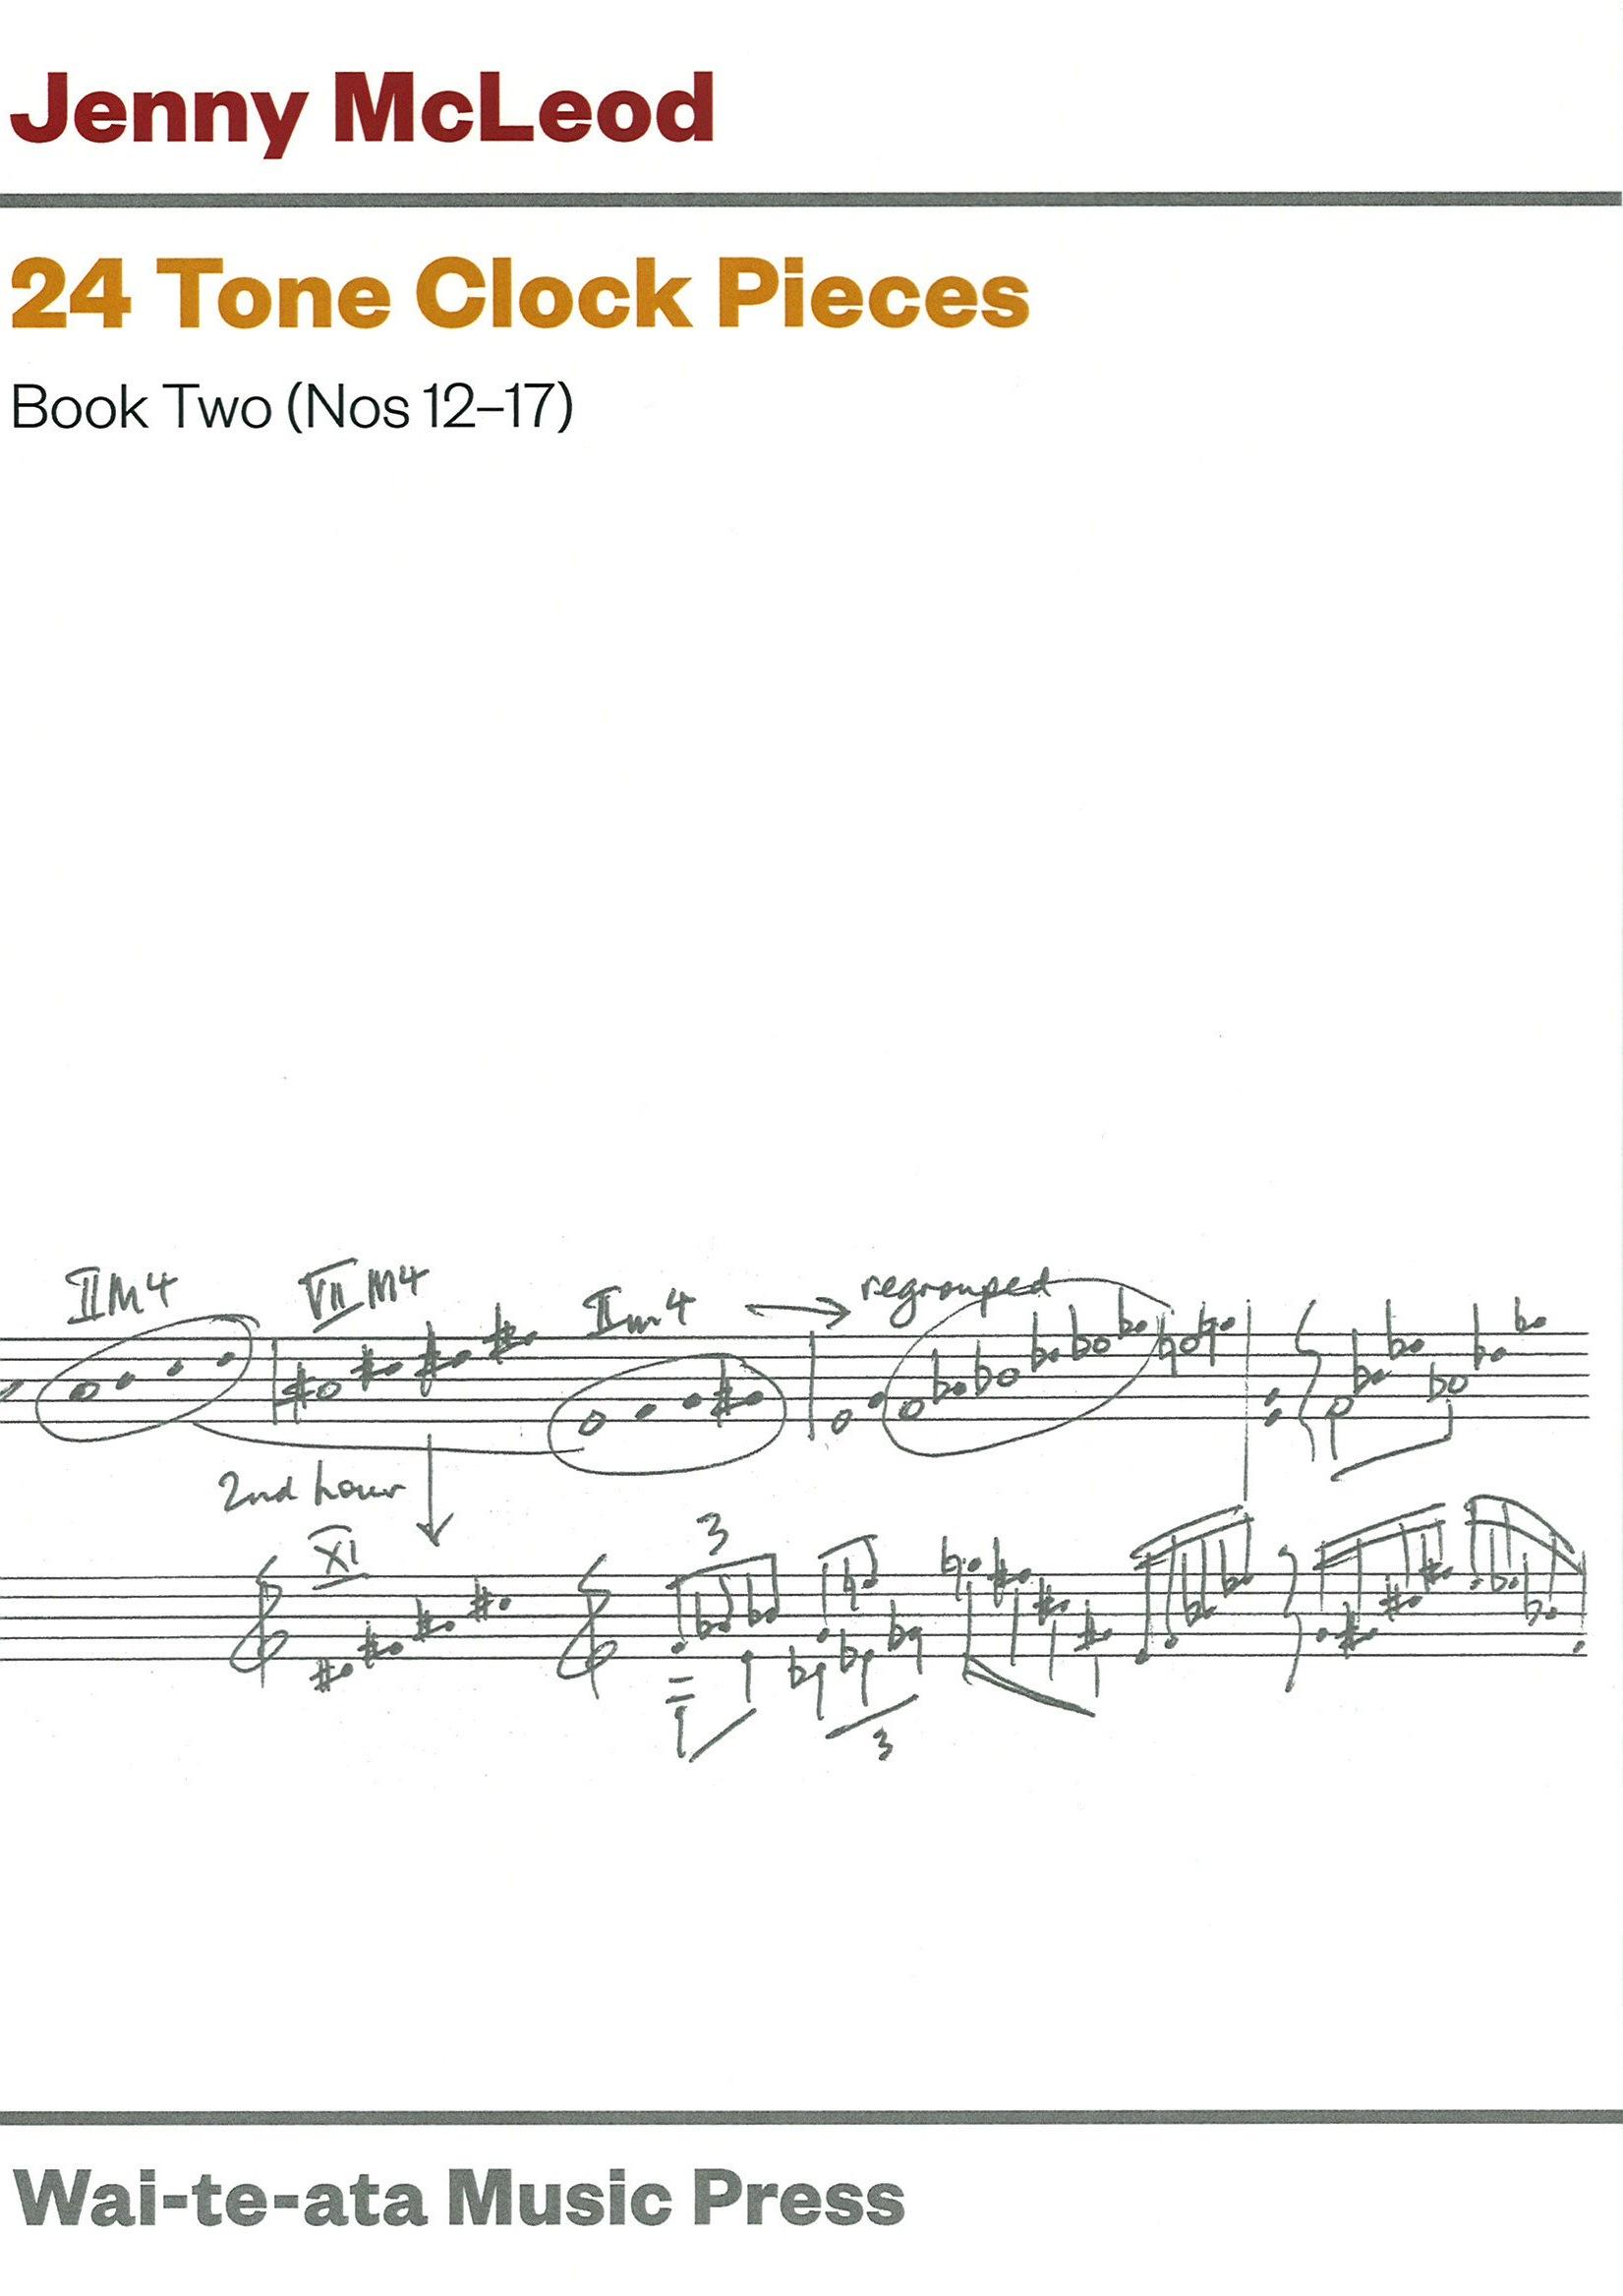 Jenny McLeod: 24 Tone Clock Pieces - Book Two (Nos 12-17) - hardcopy SCORE